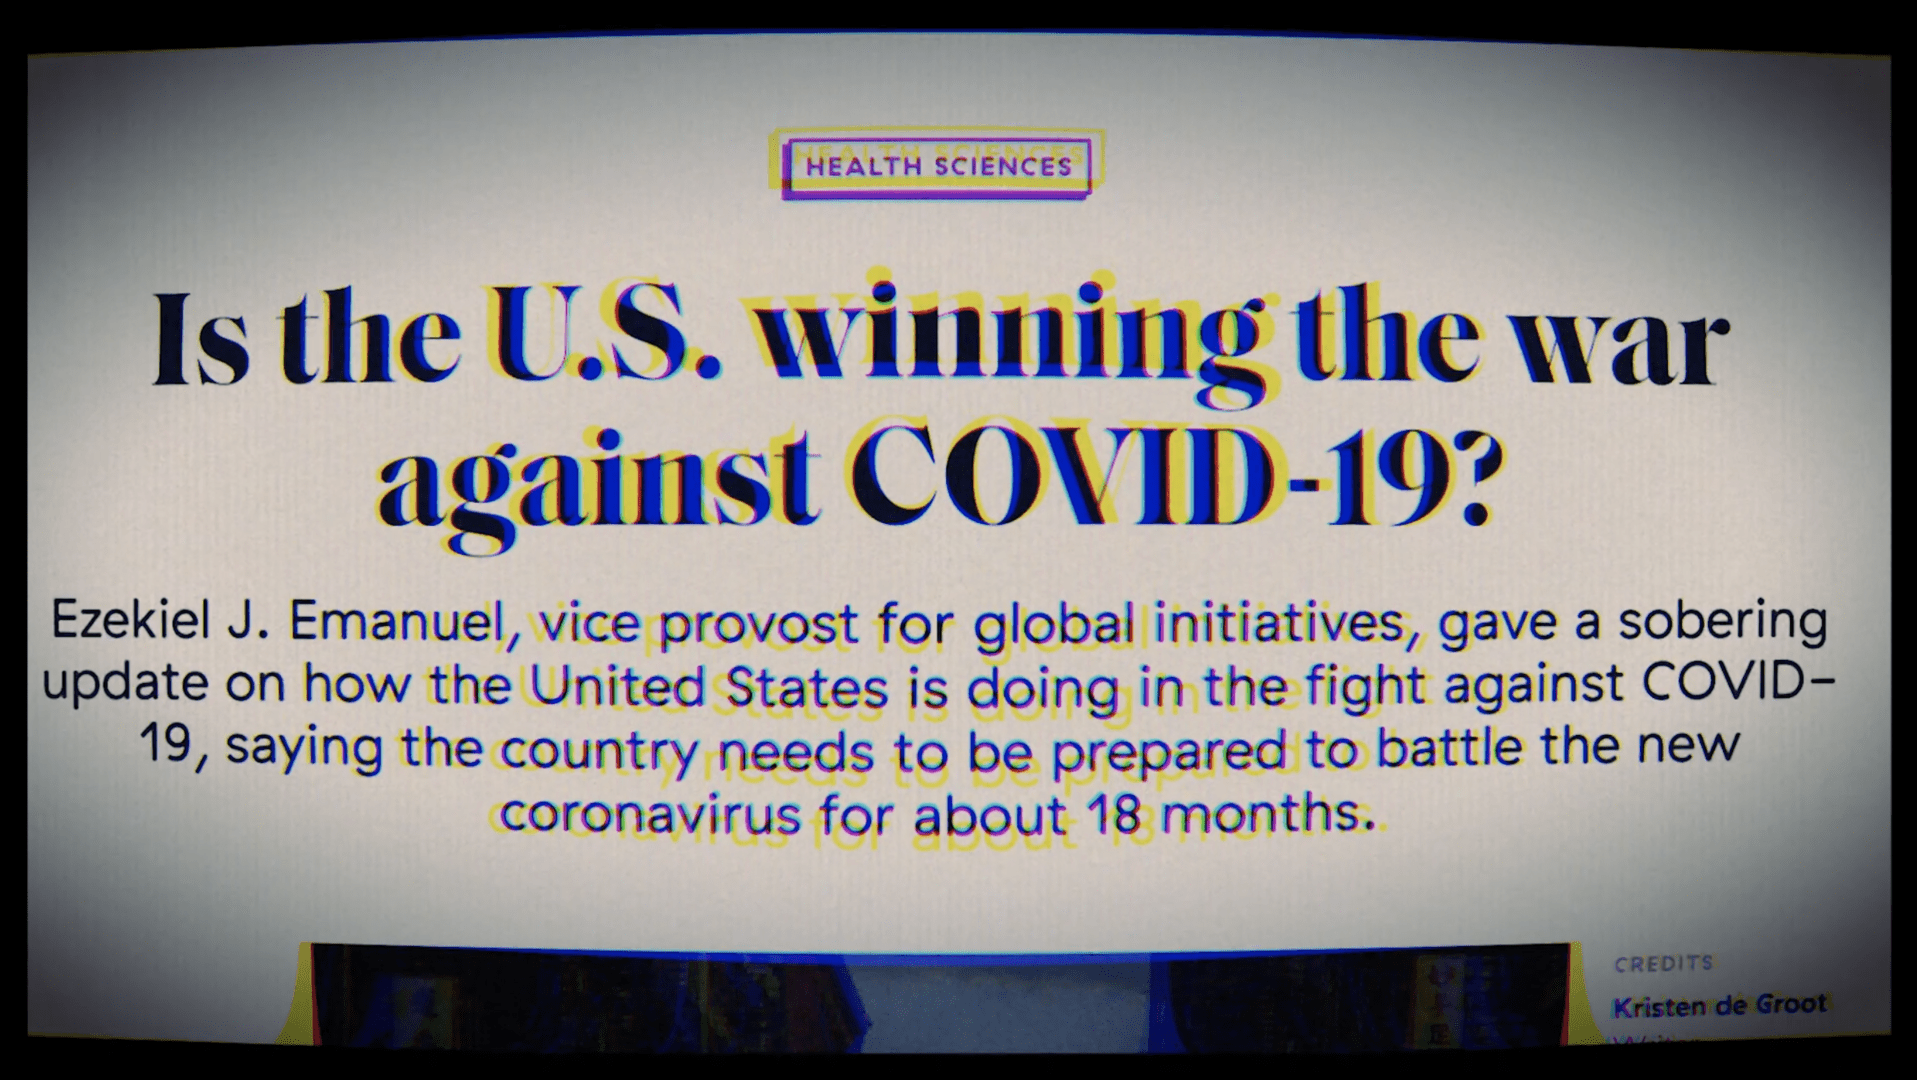 War against COVID-19